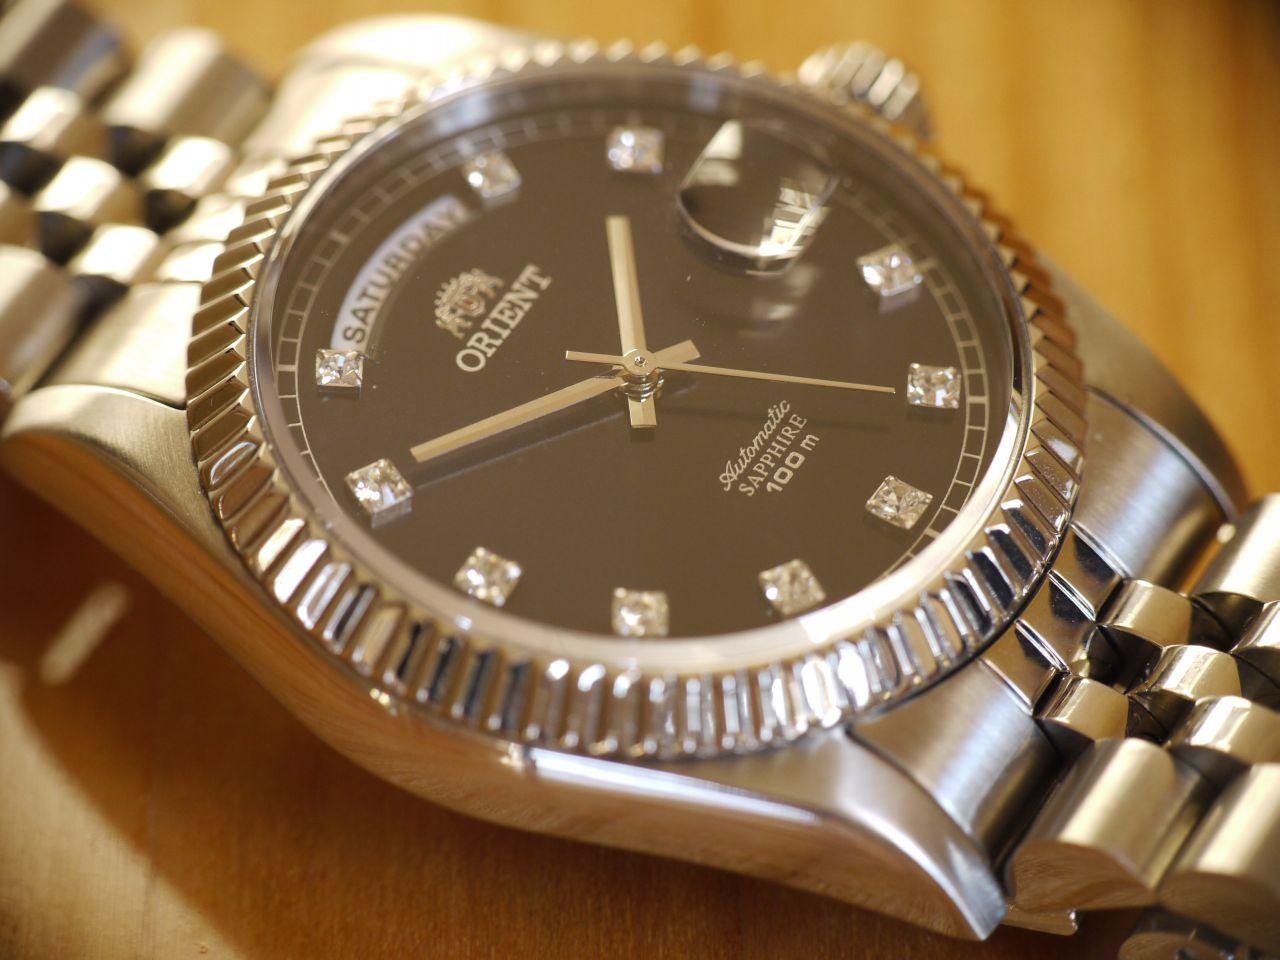 philip persio watches eBay